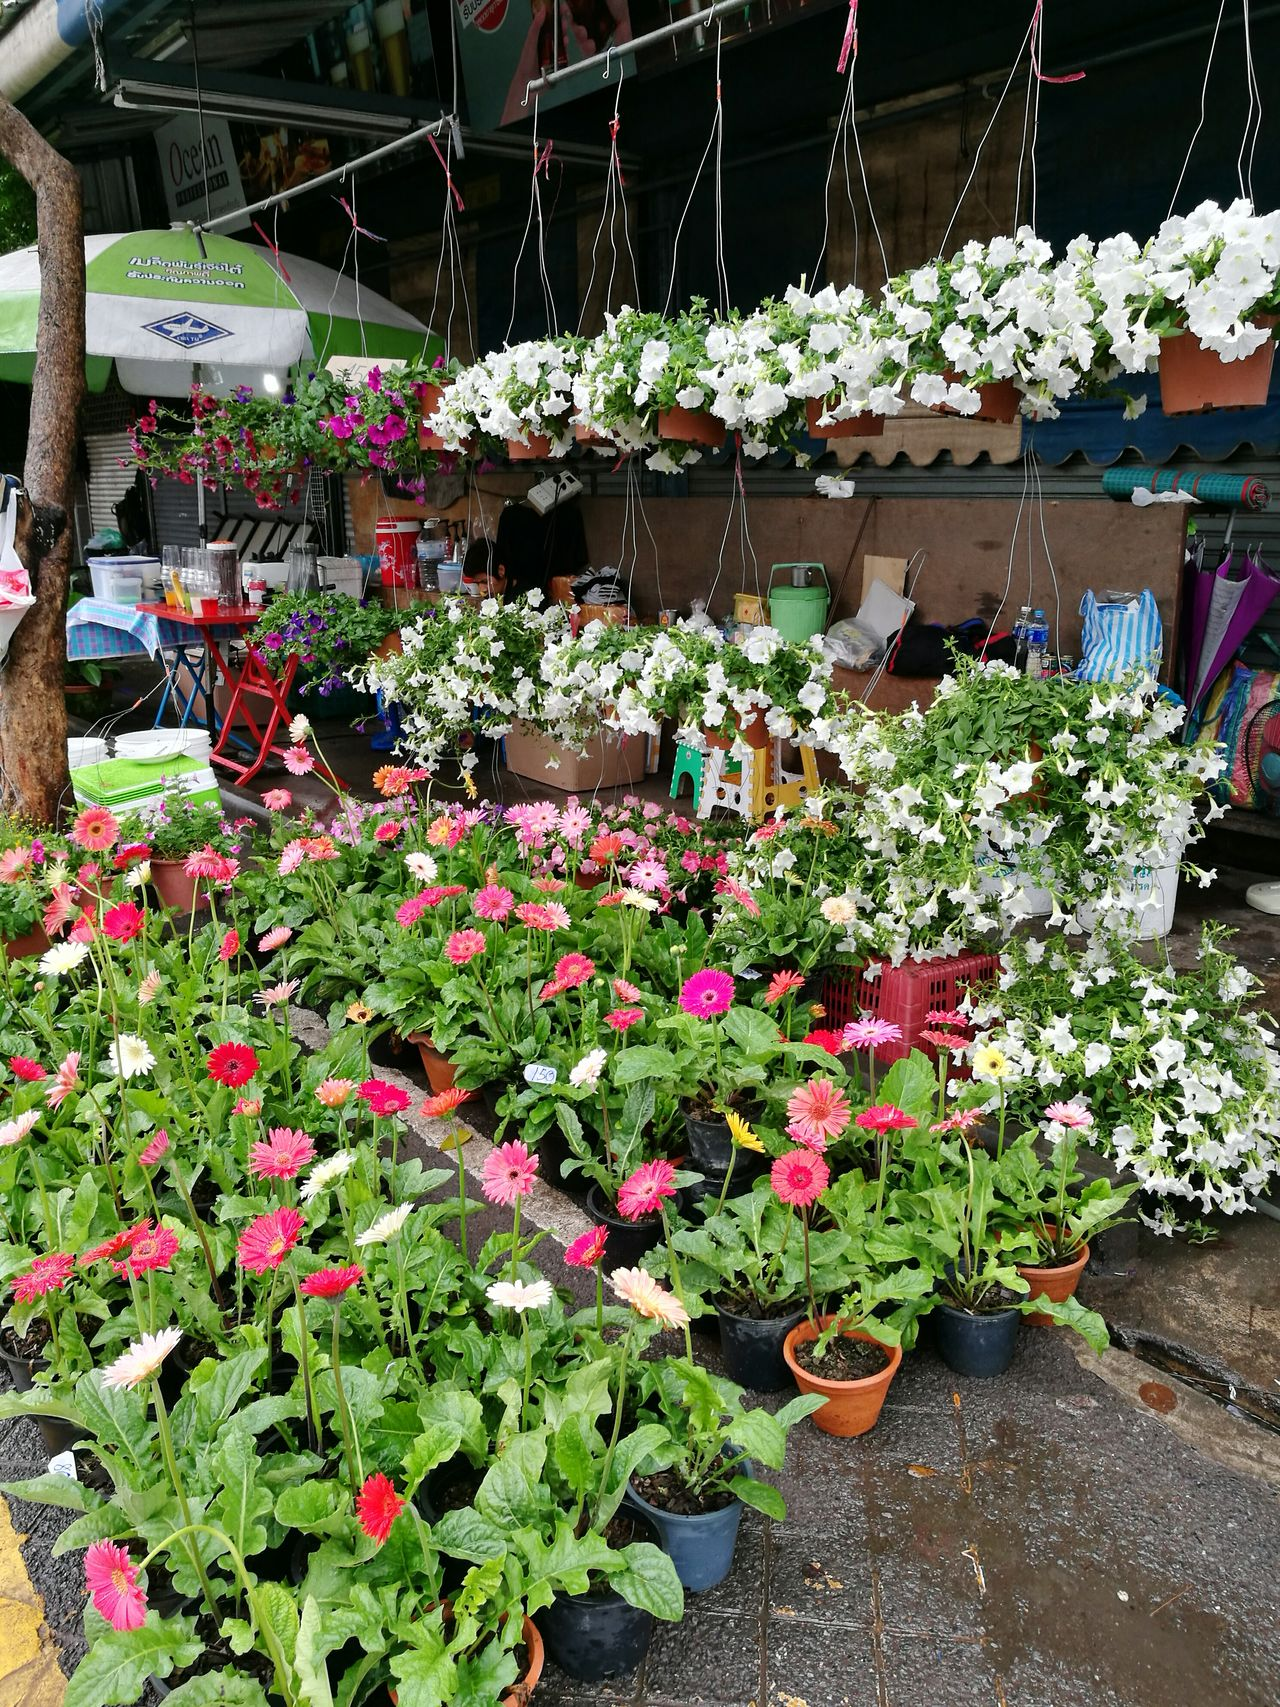 Flower Plant Beauty In Nature Blossom For Sale Flower Shop Flower Stall Flower Market Chatuchak Weekend Market